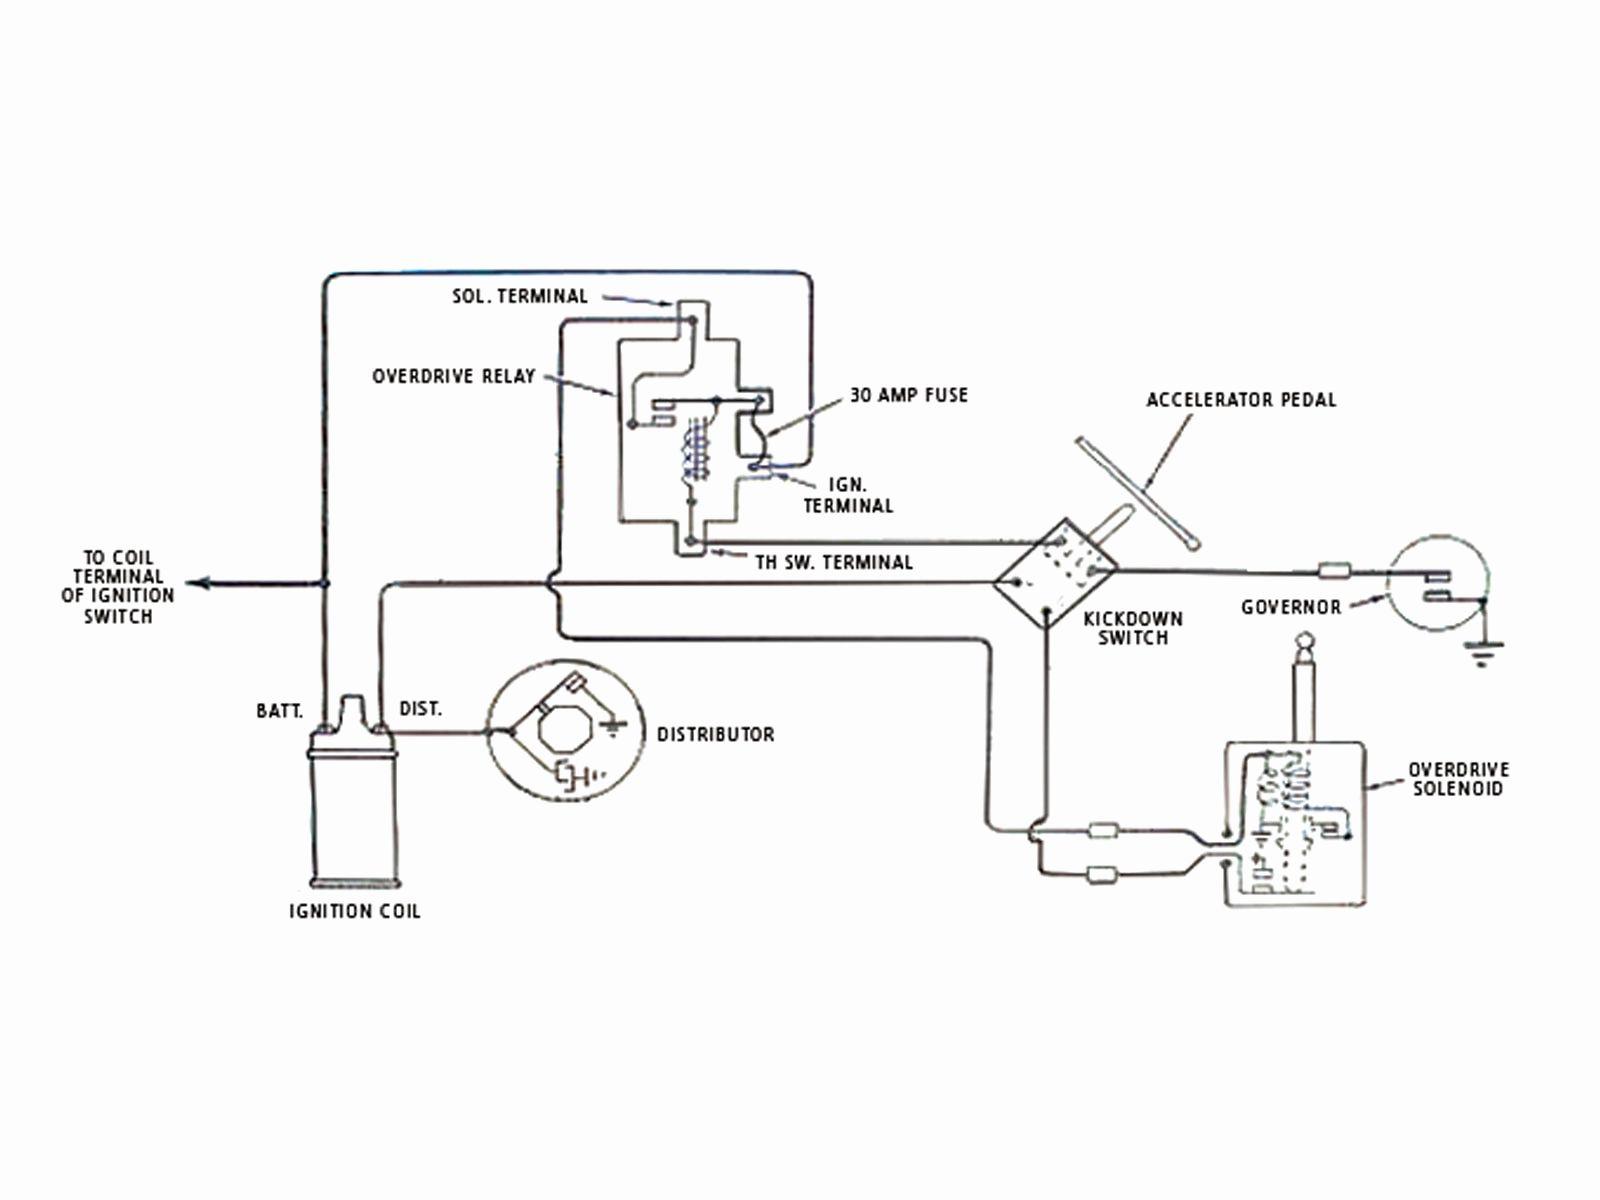 General Motors Wiring Diagram Lovely Borg Warner Overdrive Hot Rod - General Motors Wiring Diagram